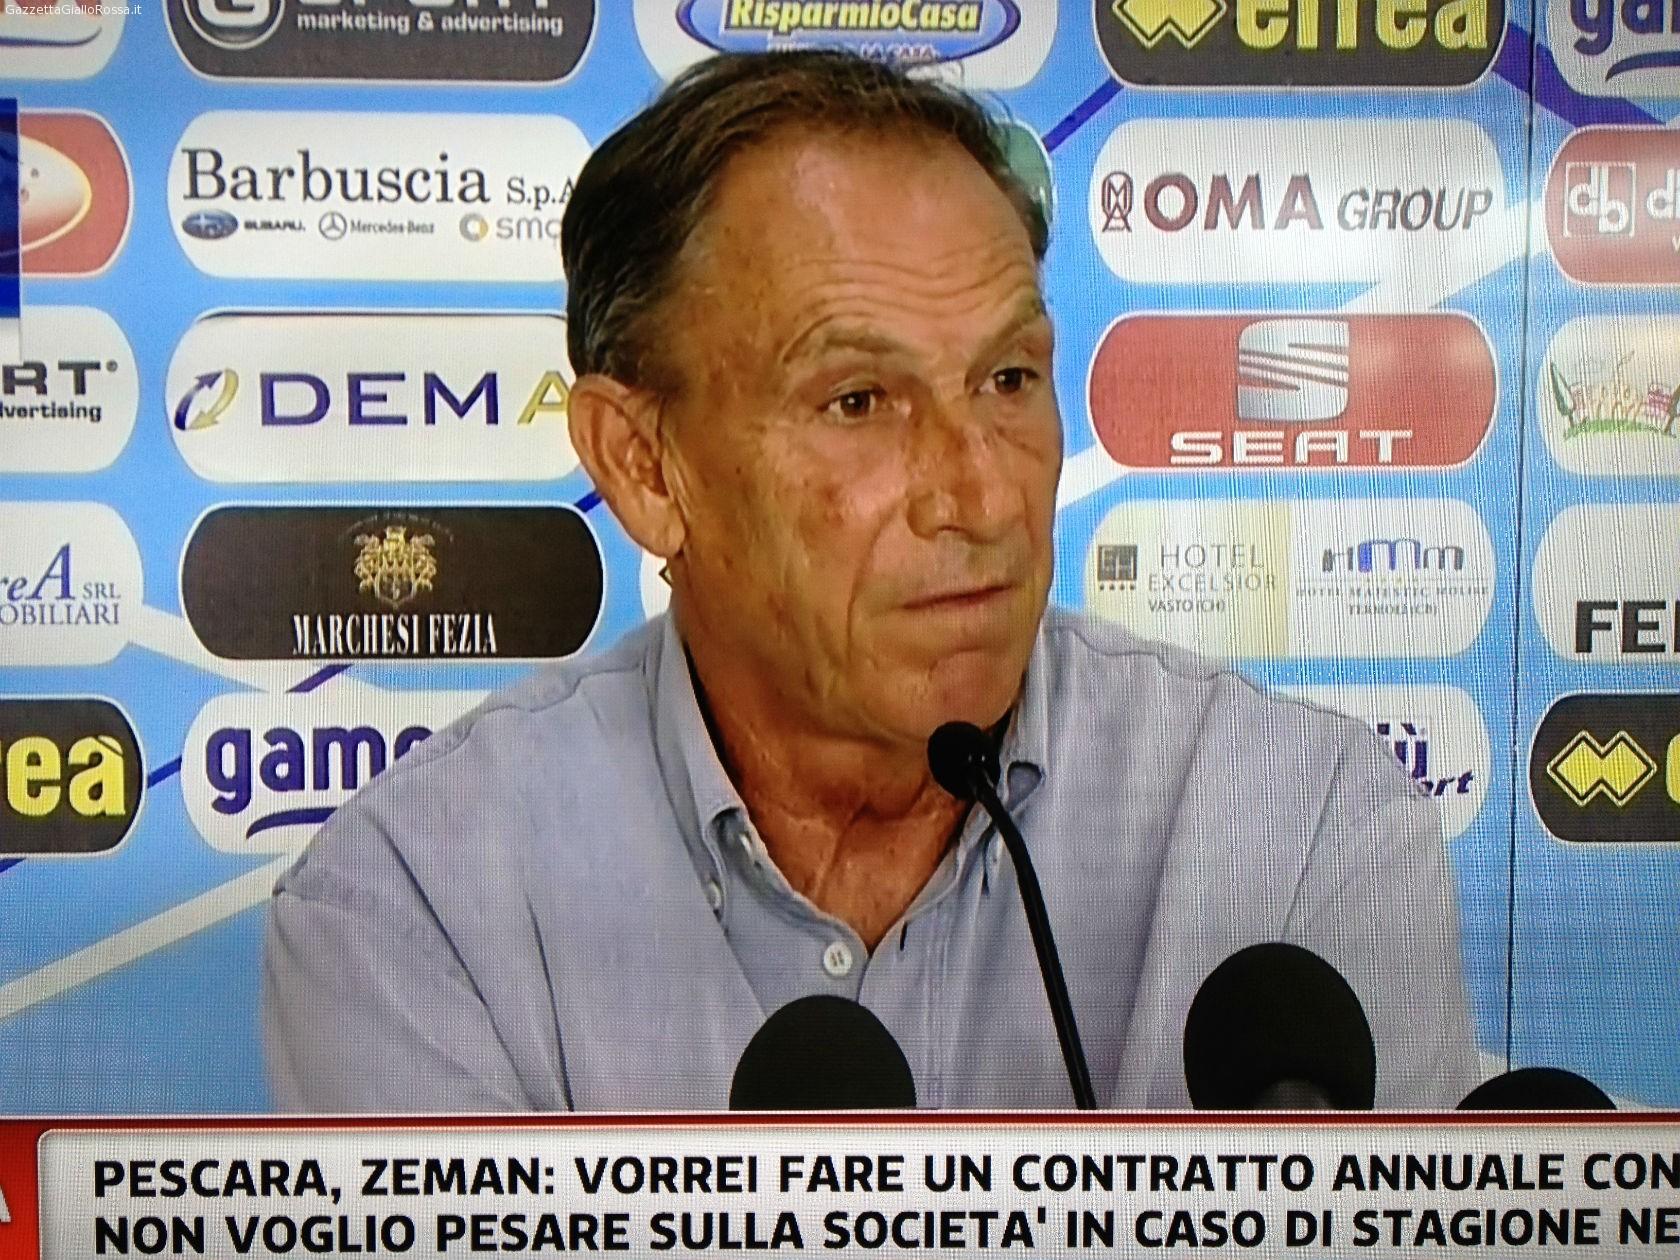 Chievo-Pescara streaming - diretta tv, dove vederla